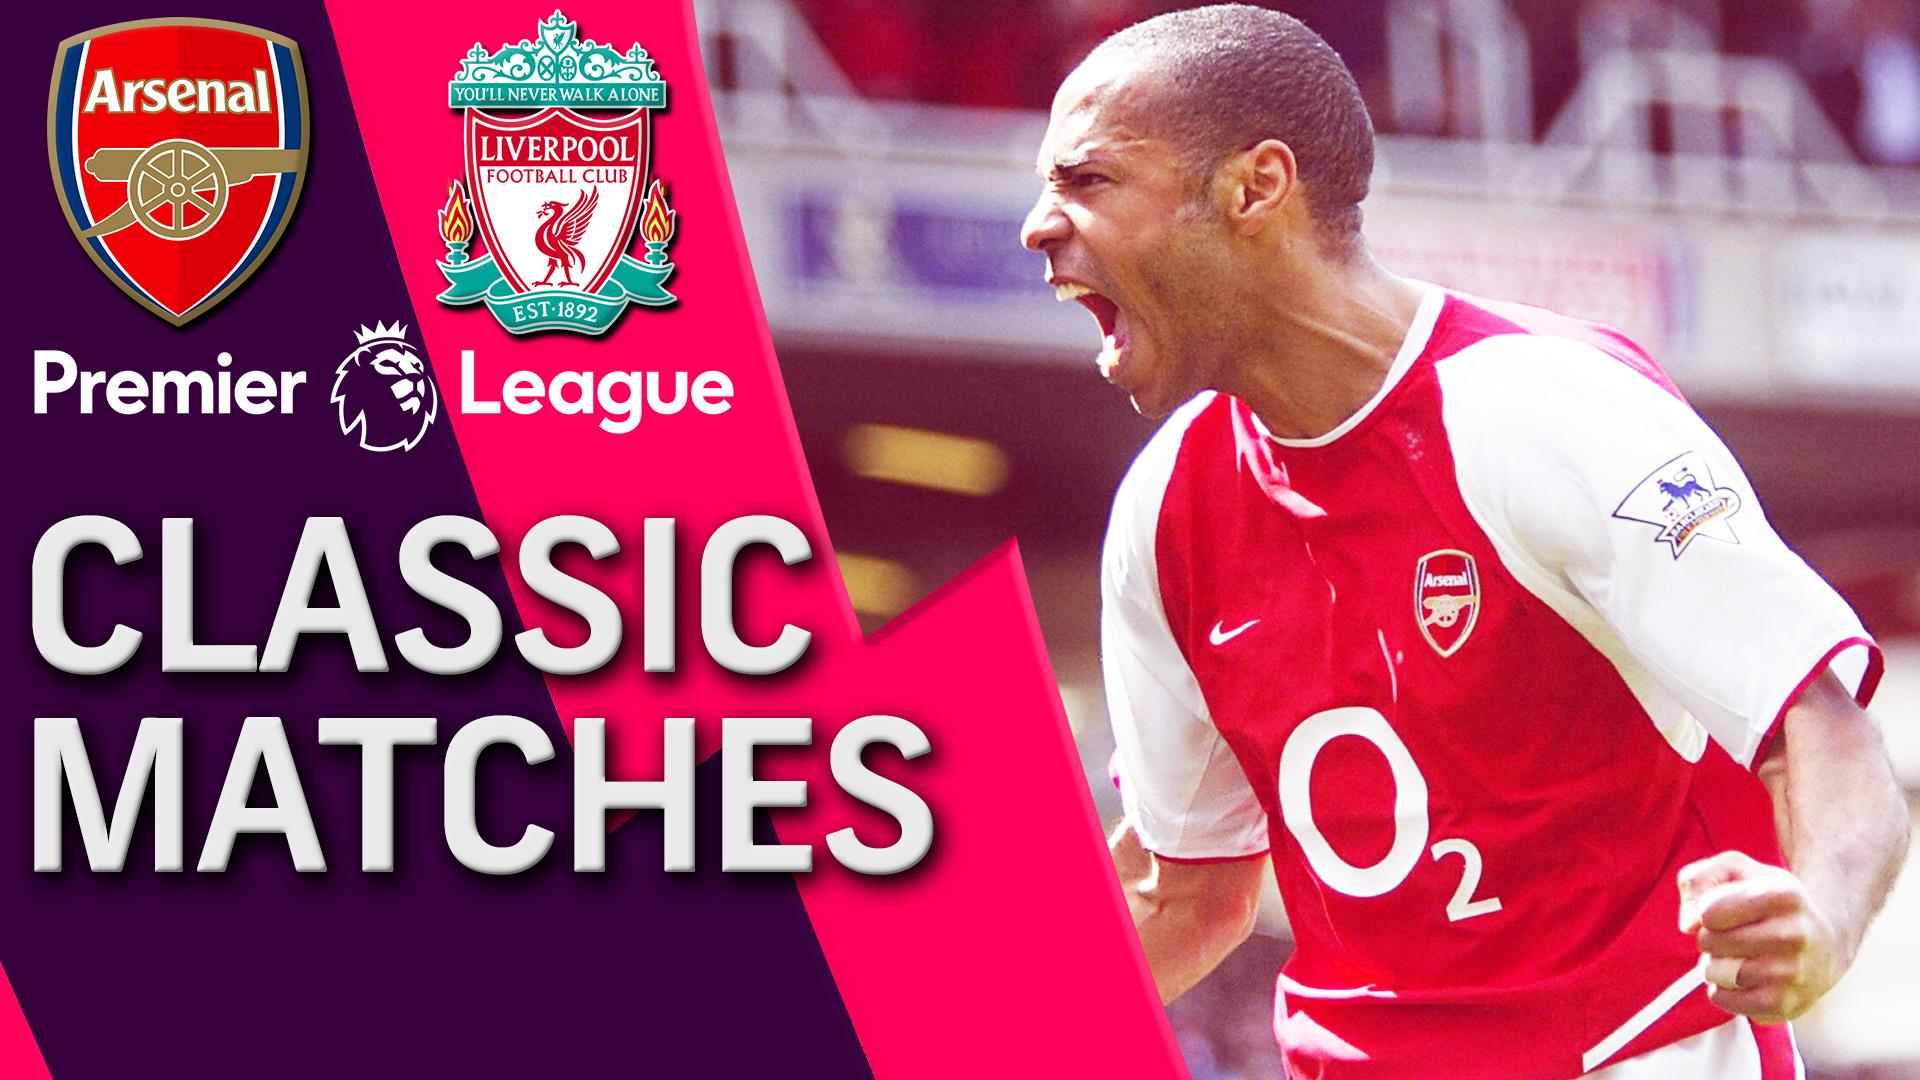 Premier League classic match: Arsenal v. Liverpool 2003-04